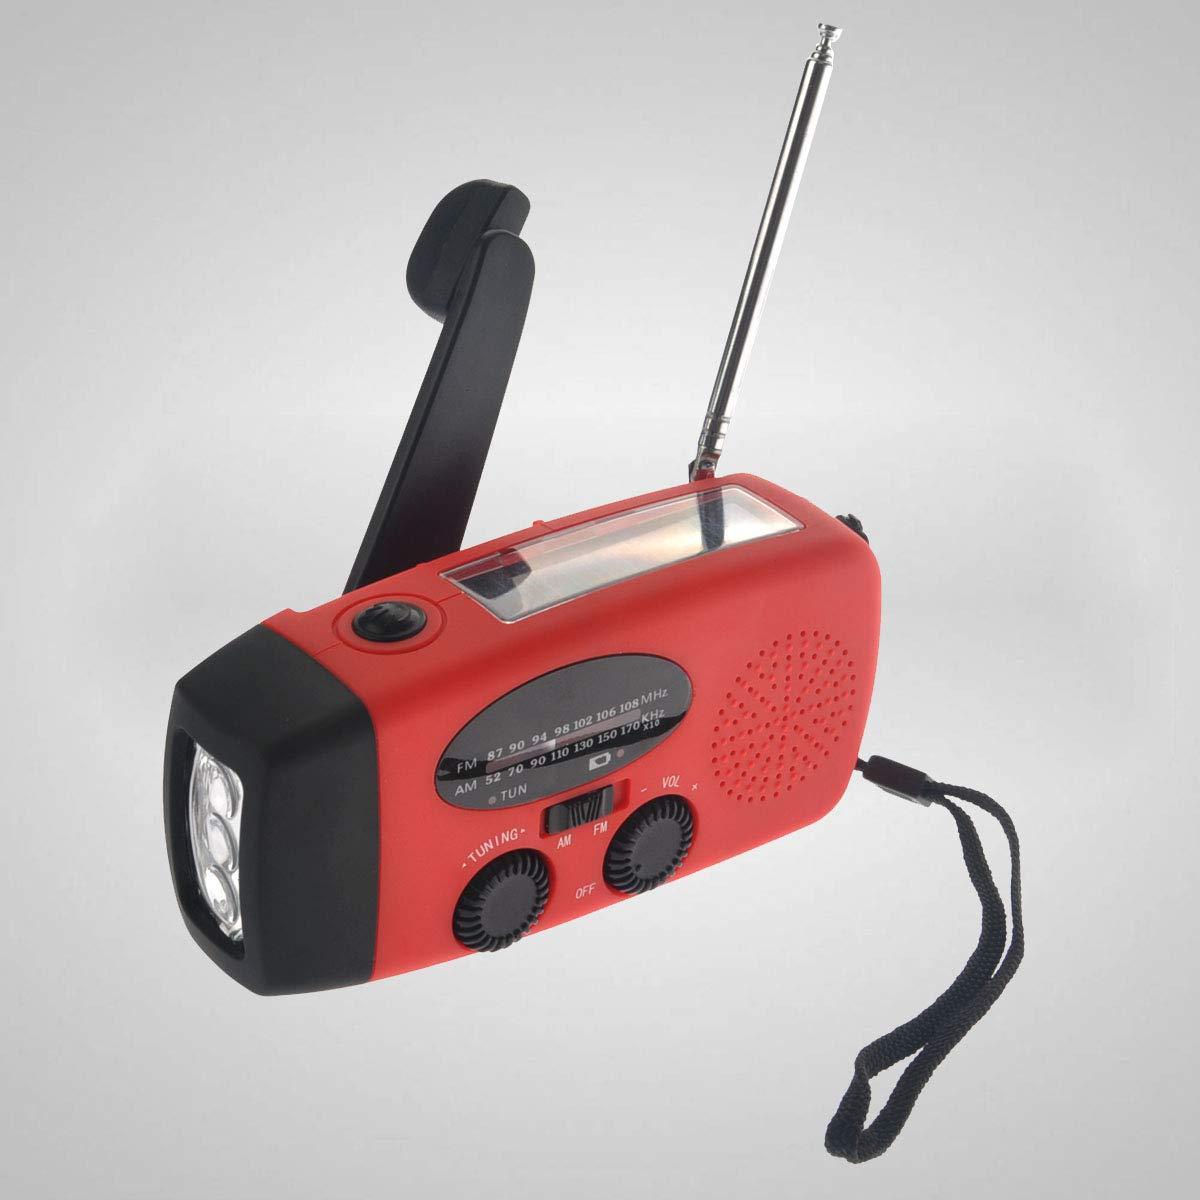 VOSAREA Emergency Solar Crank AM FM Camp Radio with LED Flashlight USB Output Port(Red) by VOSAREA (Image #3)